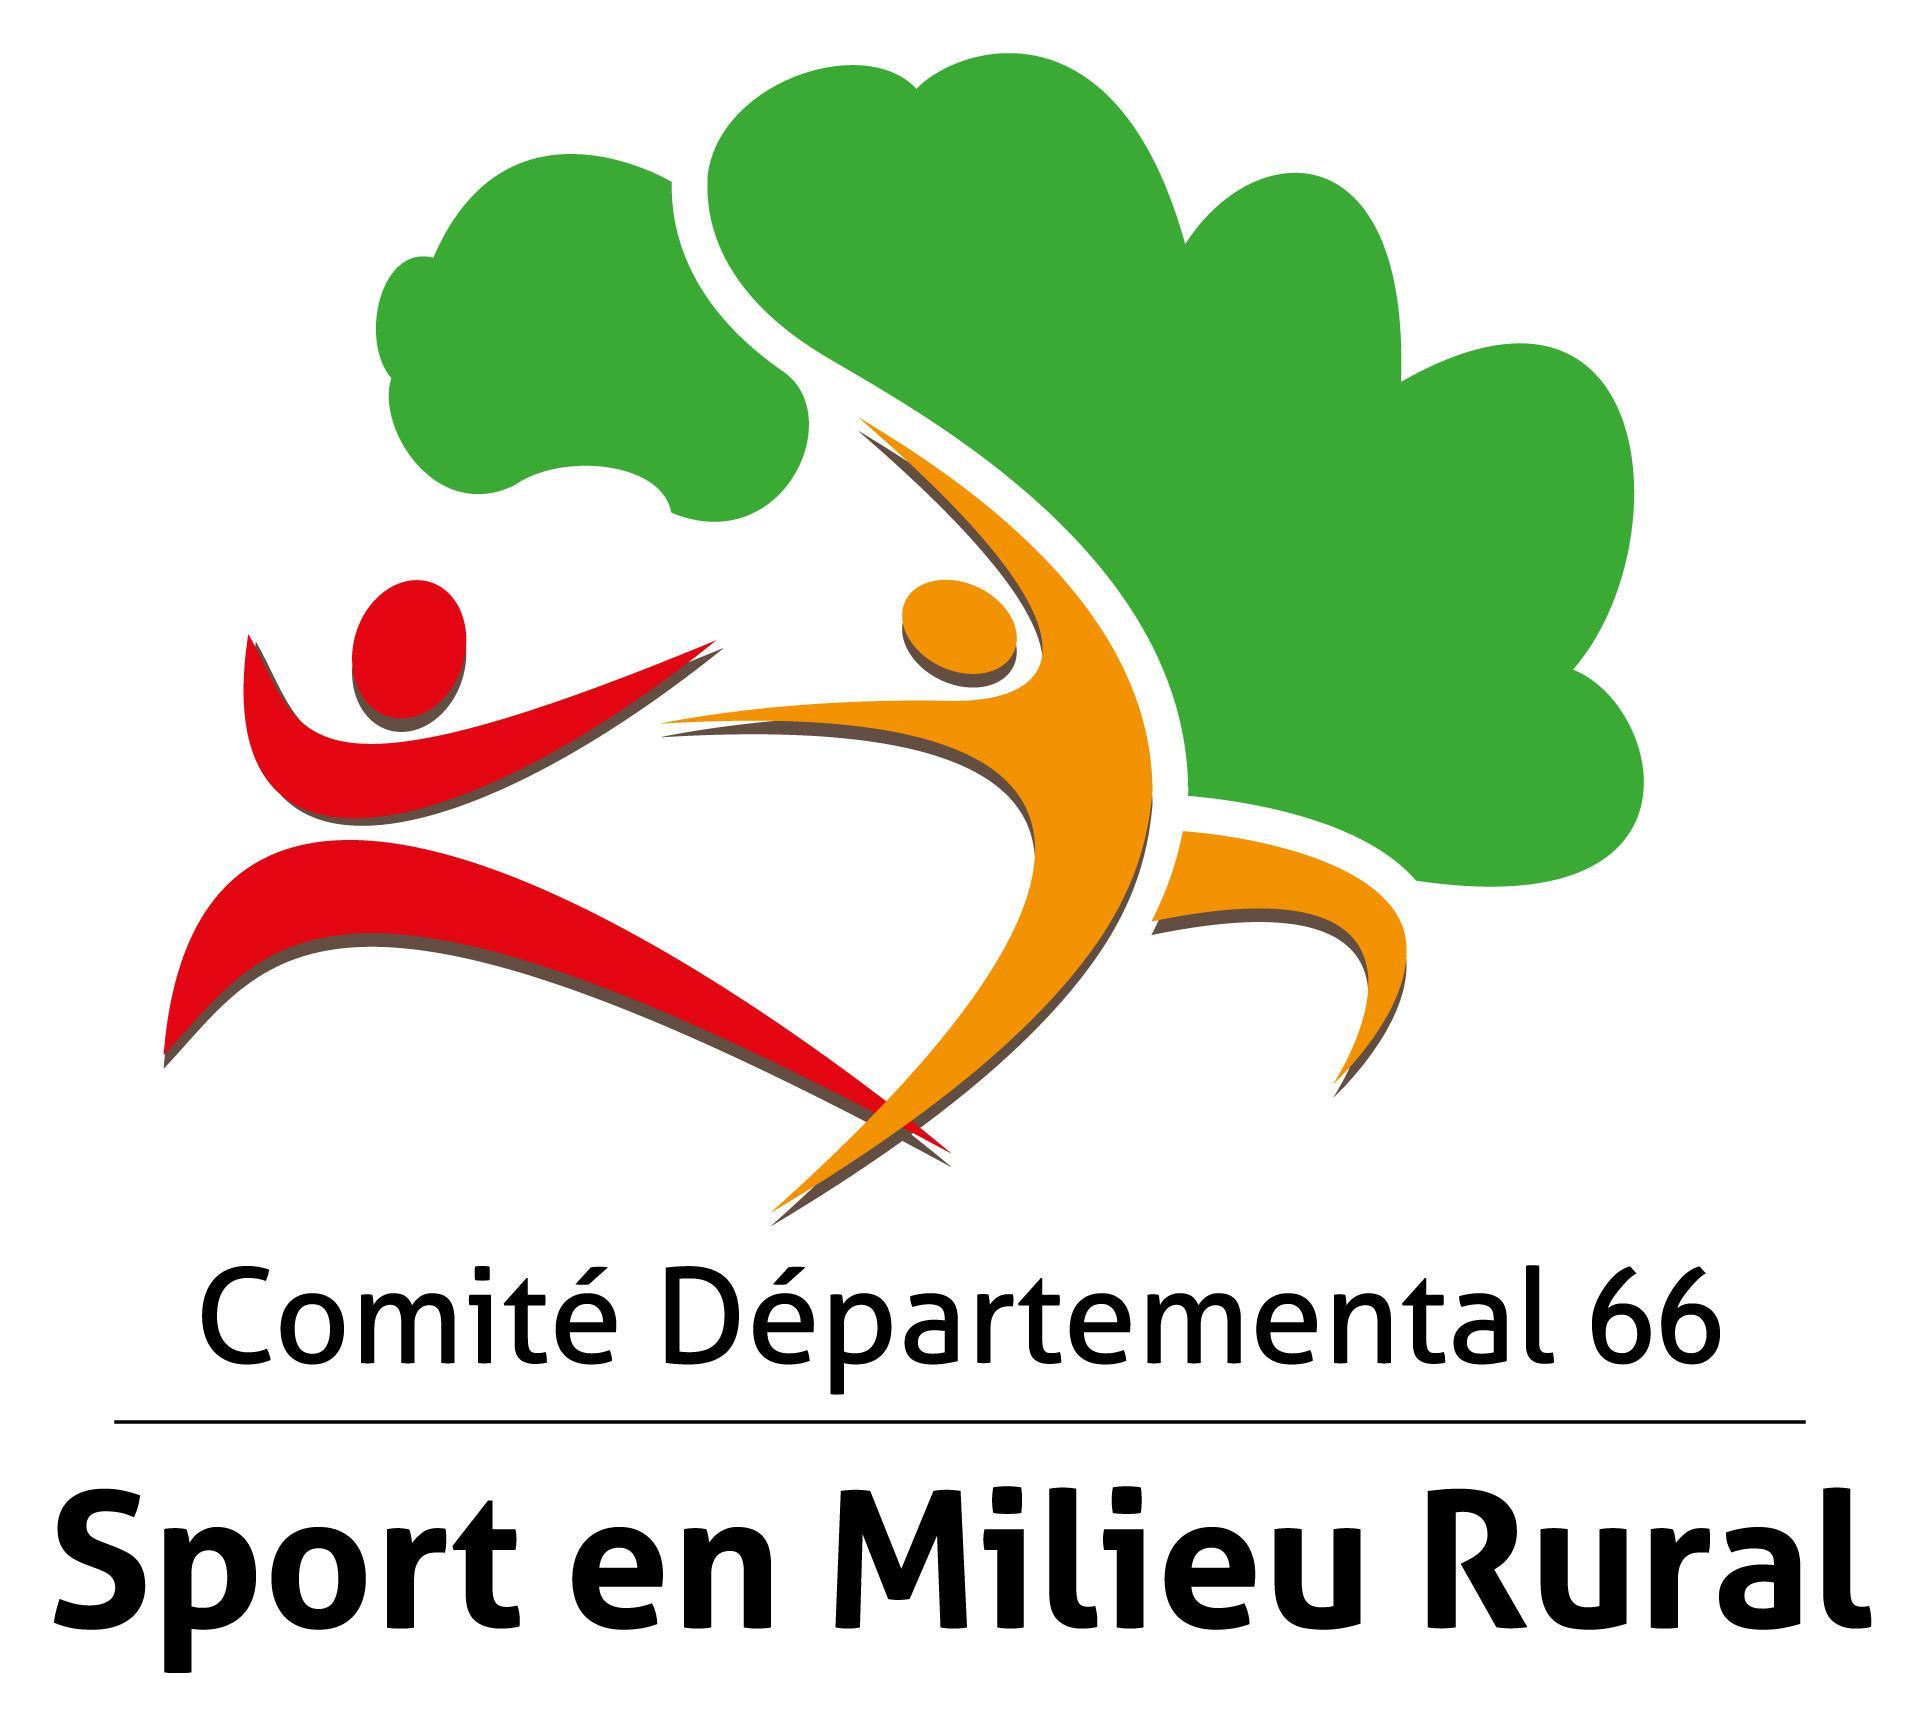 sport-rural